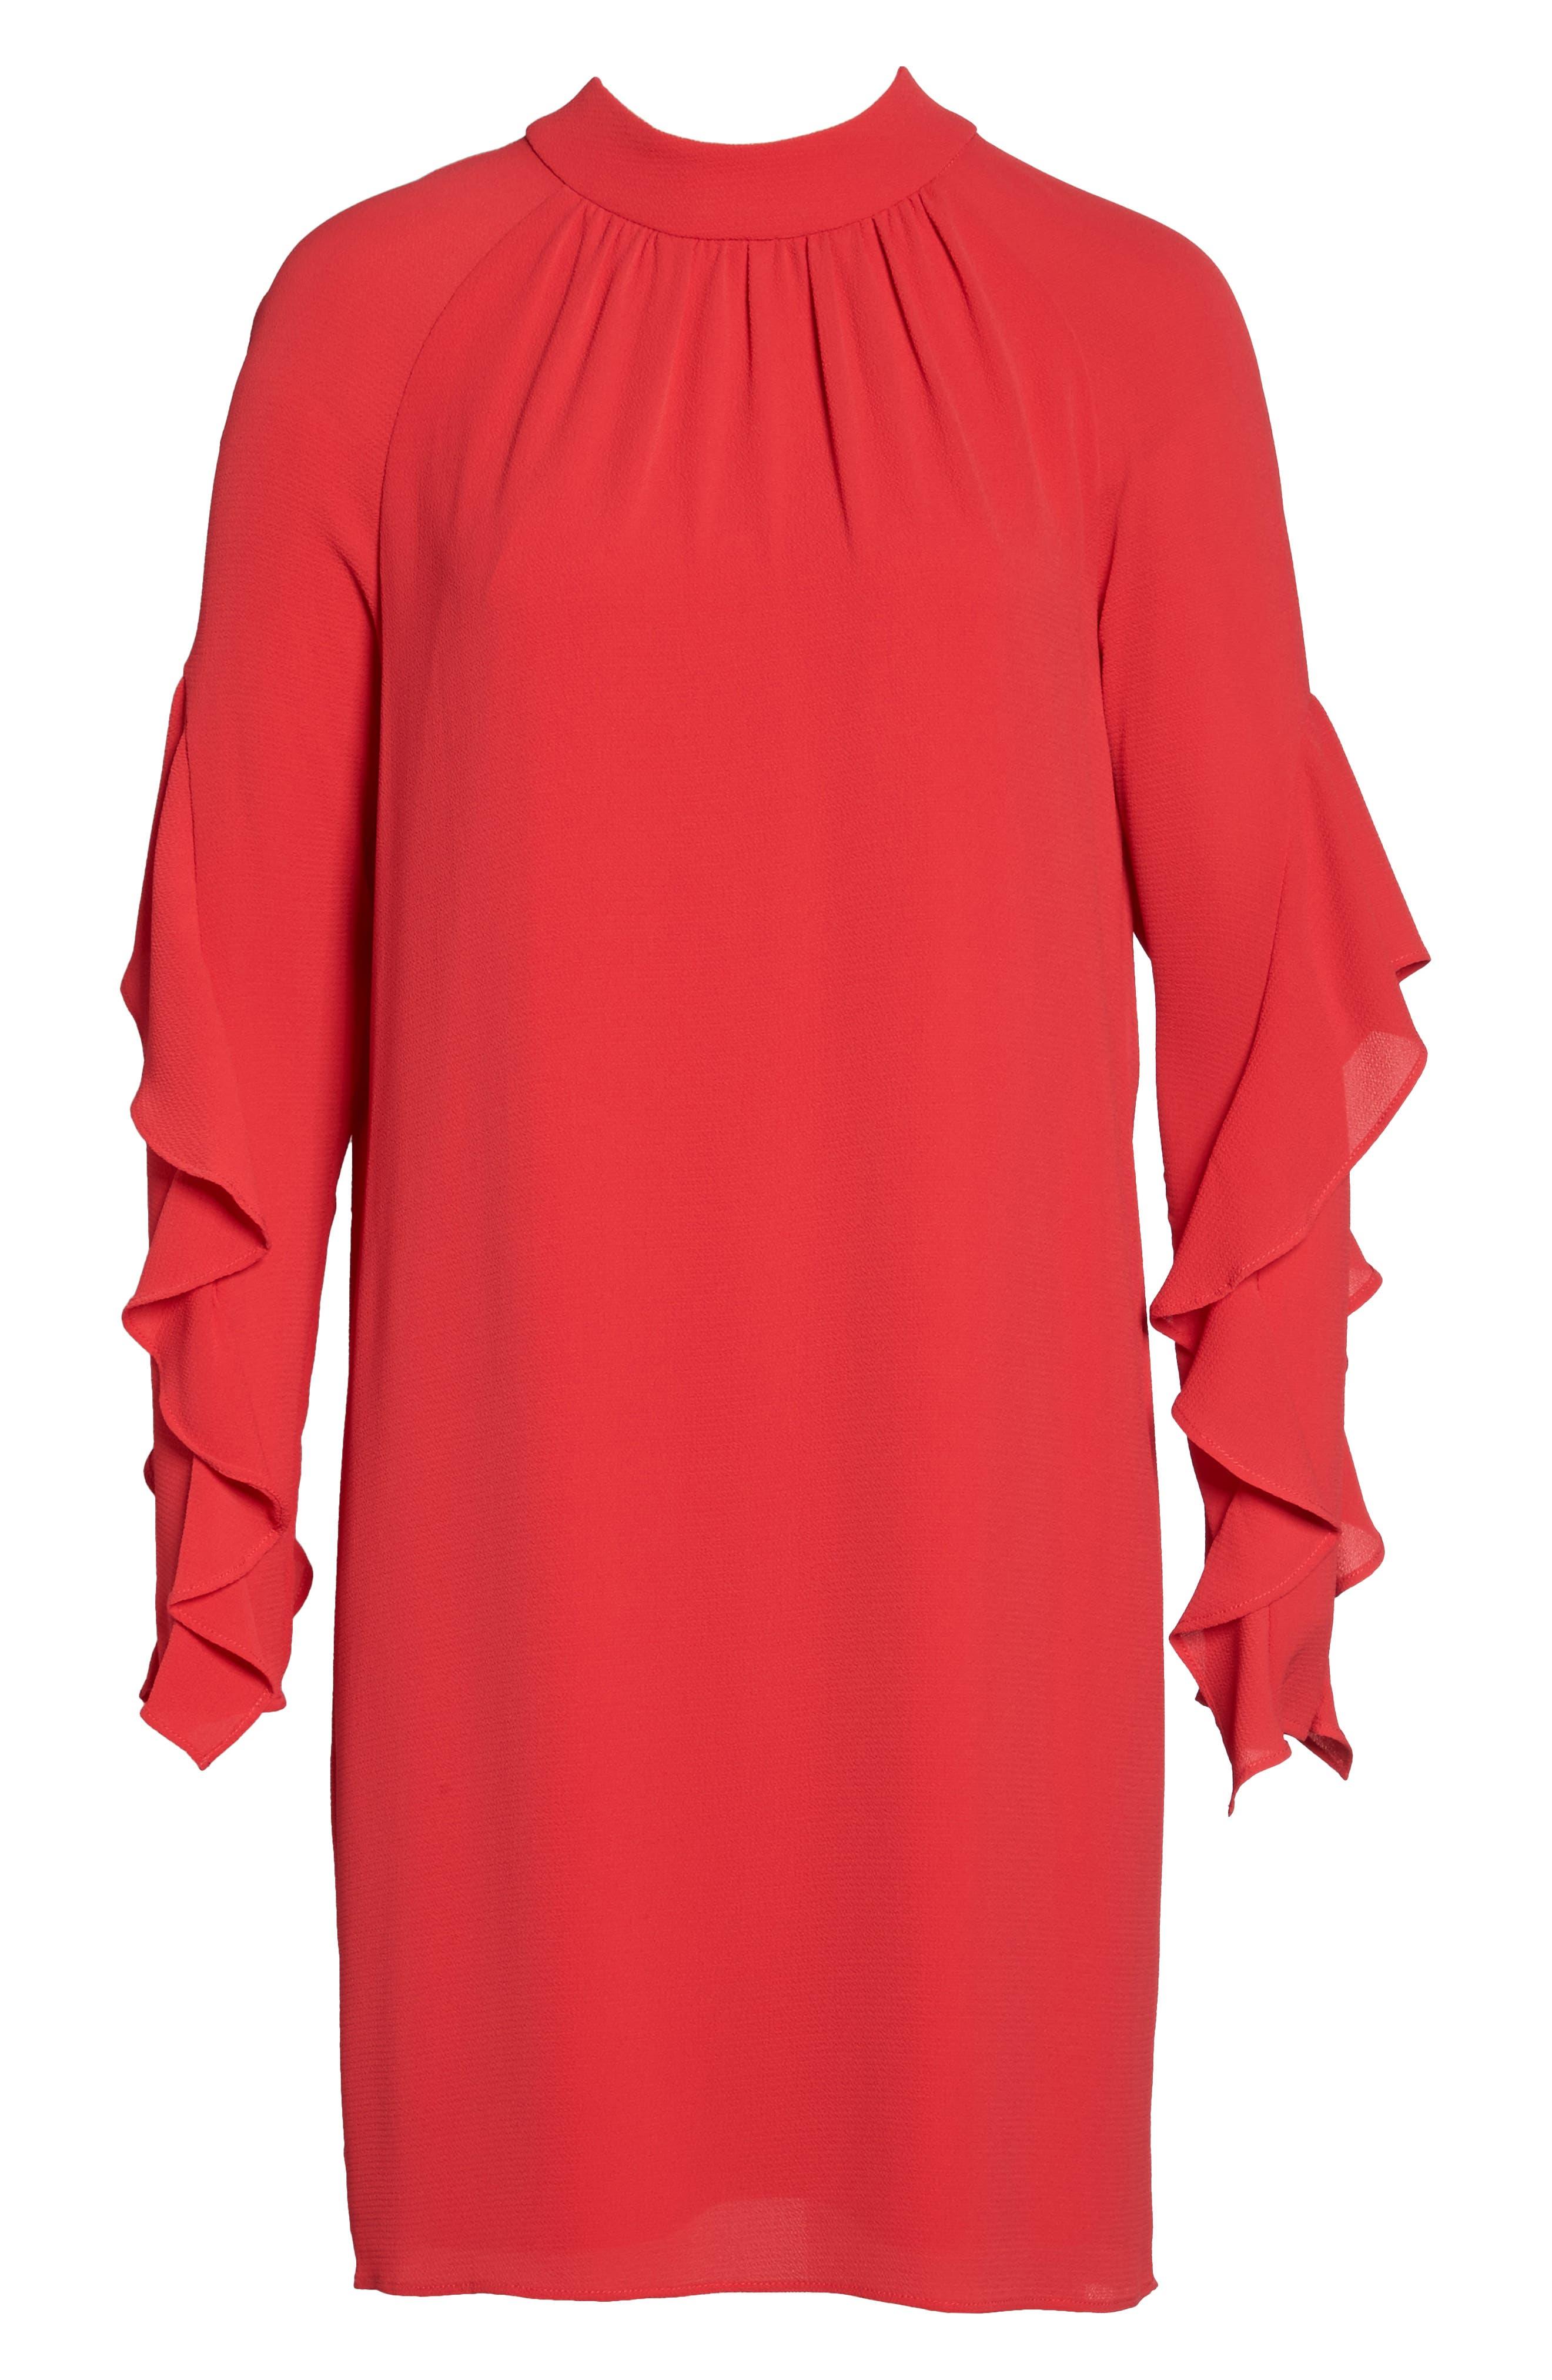 Catalina Ruffle Sleeve Dress,                             Alternate thumbnail 6, color,                             648